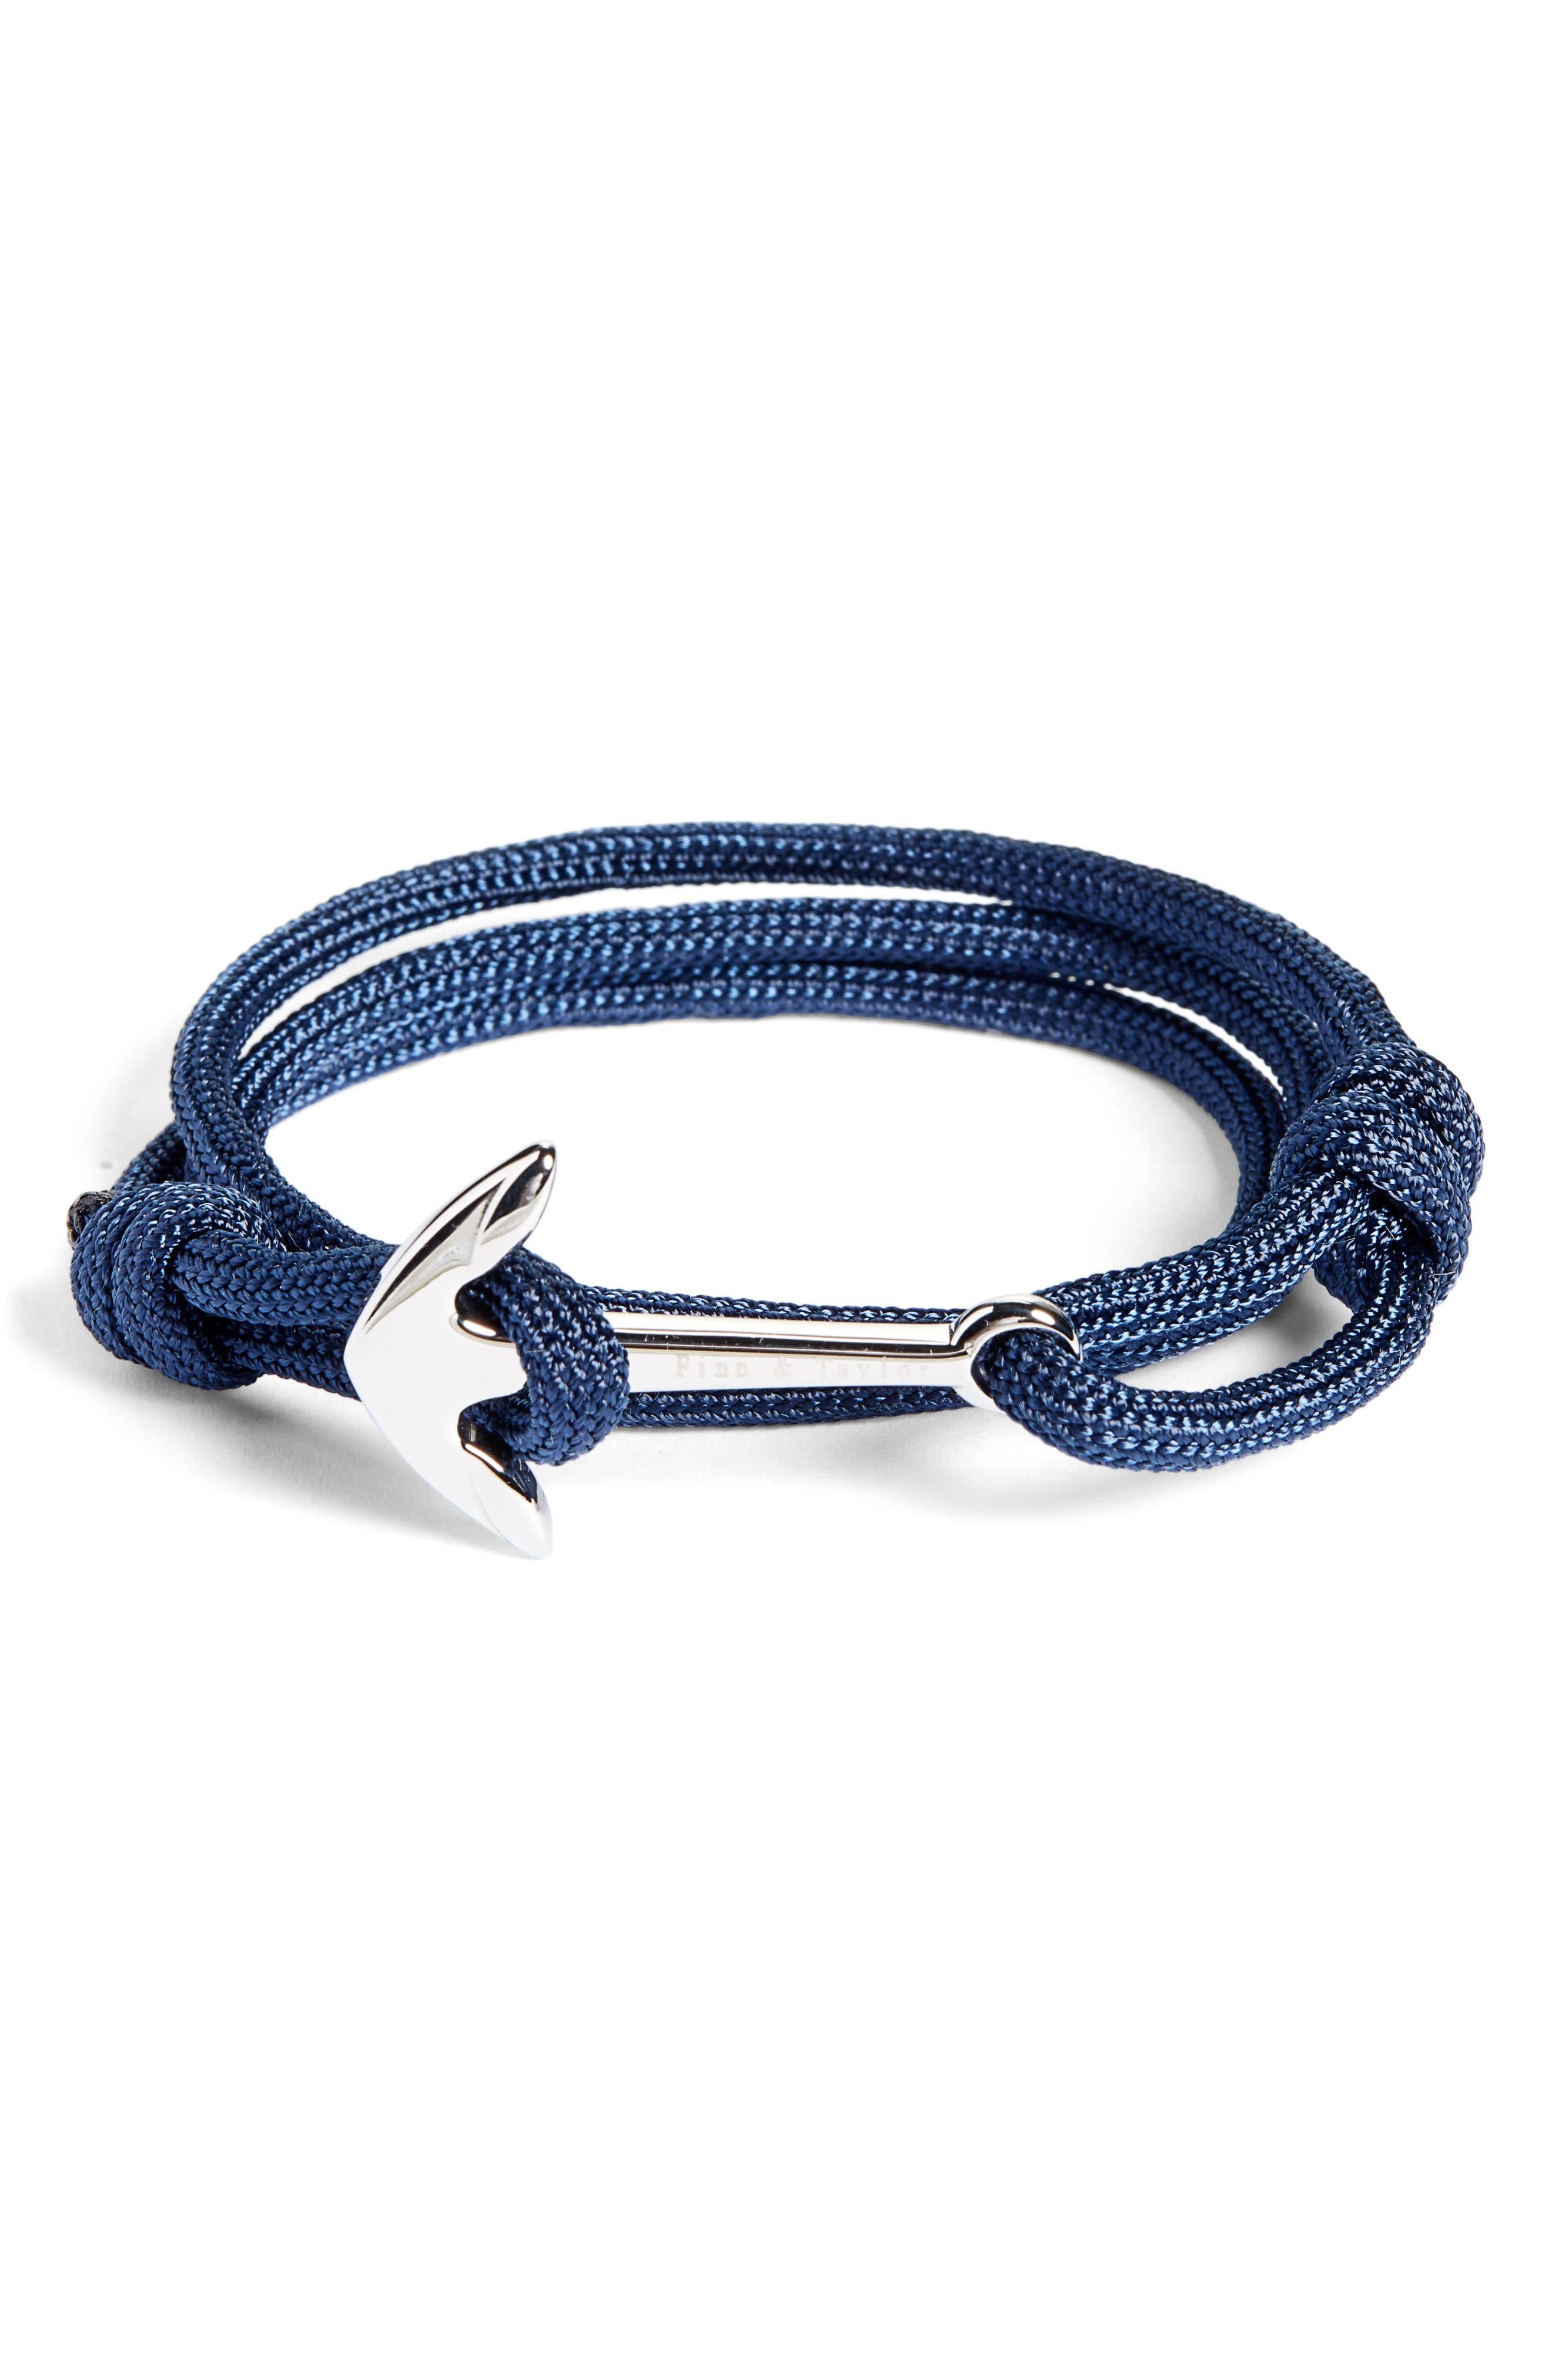 Cord Wrap Bracelet,                             Main thumbnail 1, color,                             NAVY